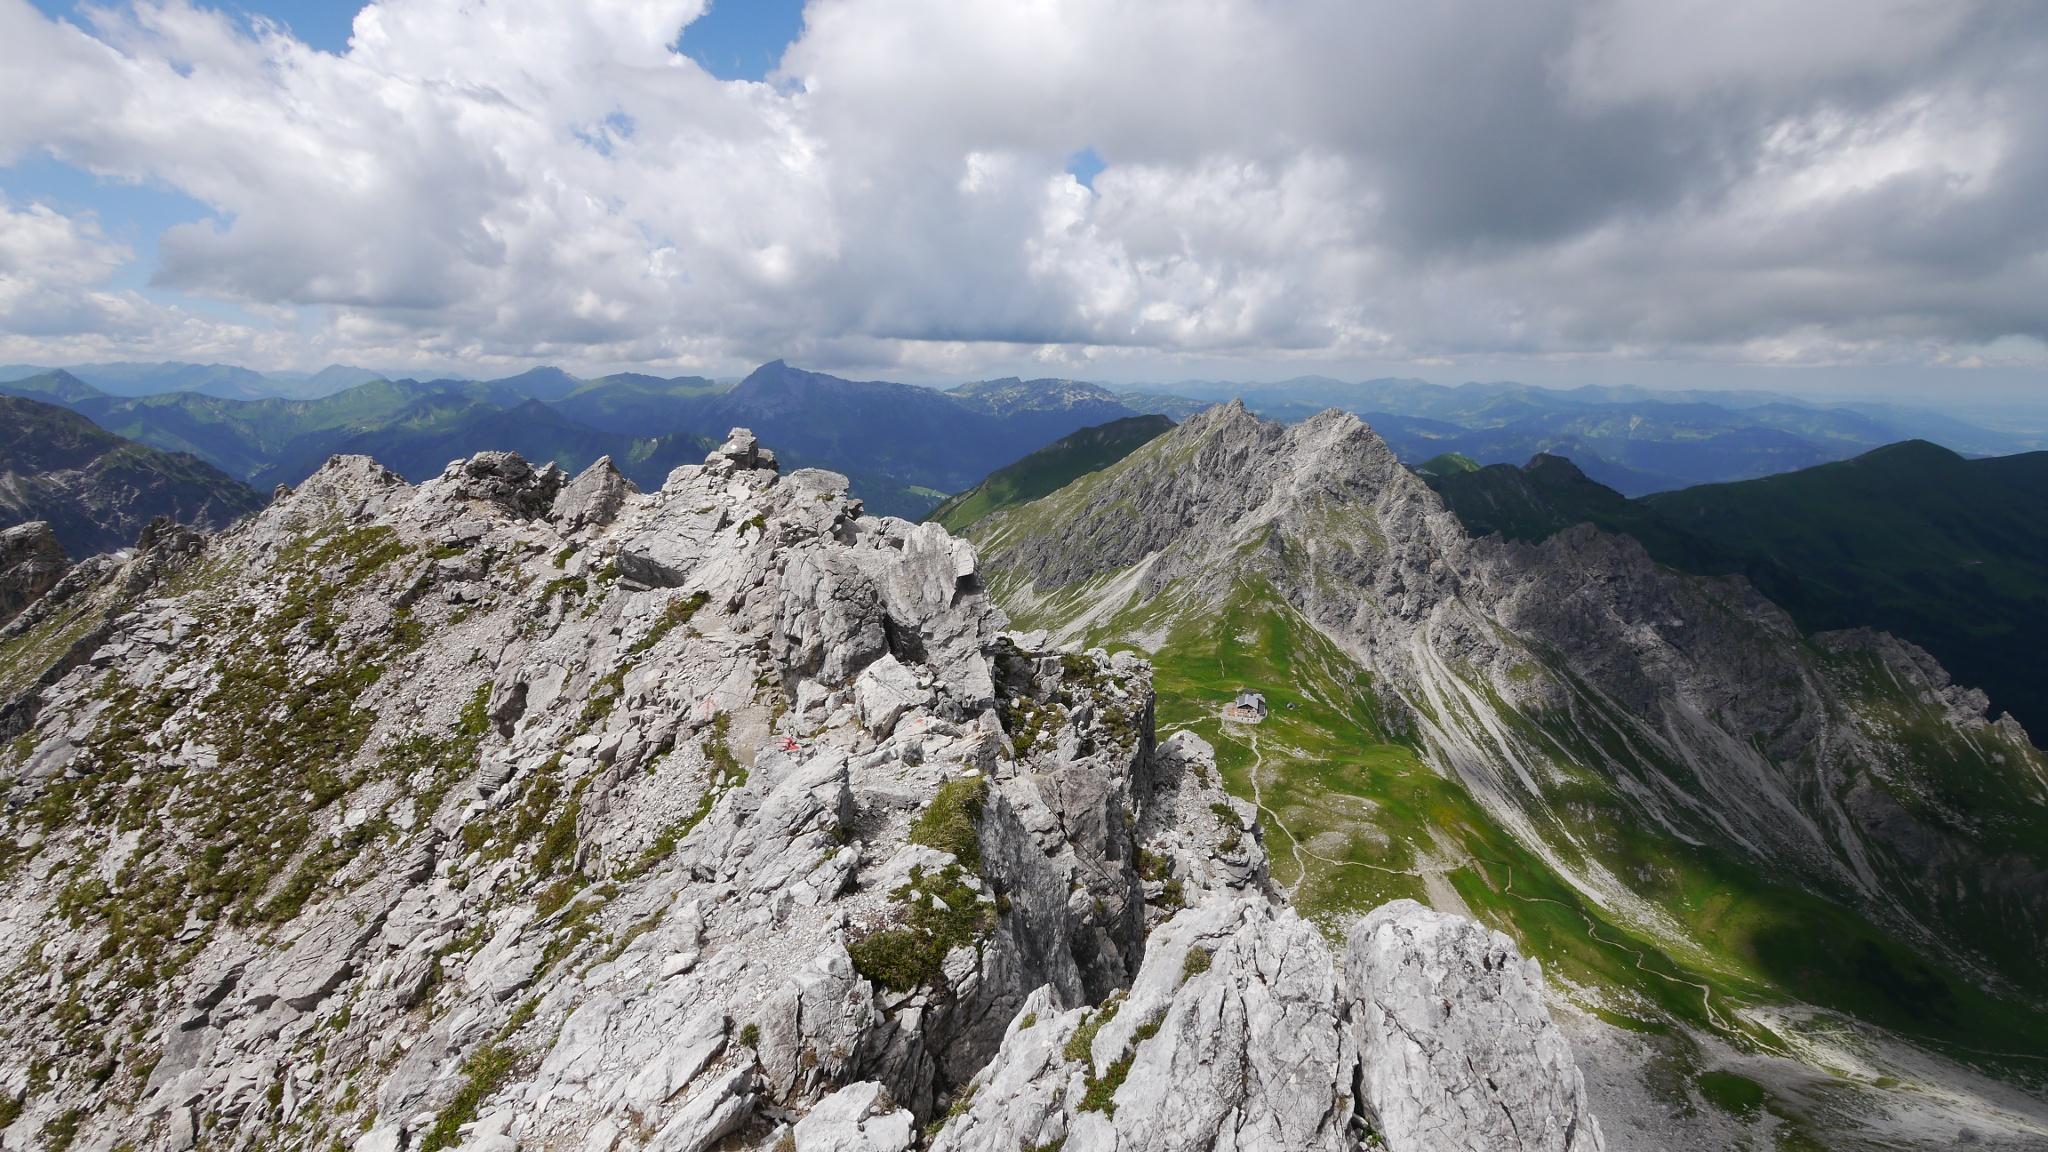 Klettersteig Kleinwalsertal : Kleinwalsertal mindelheimer klettersteig